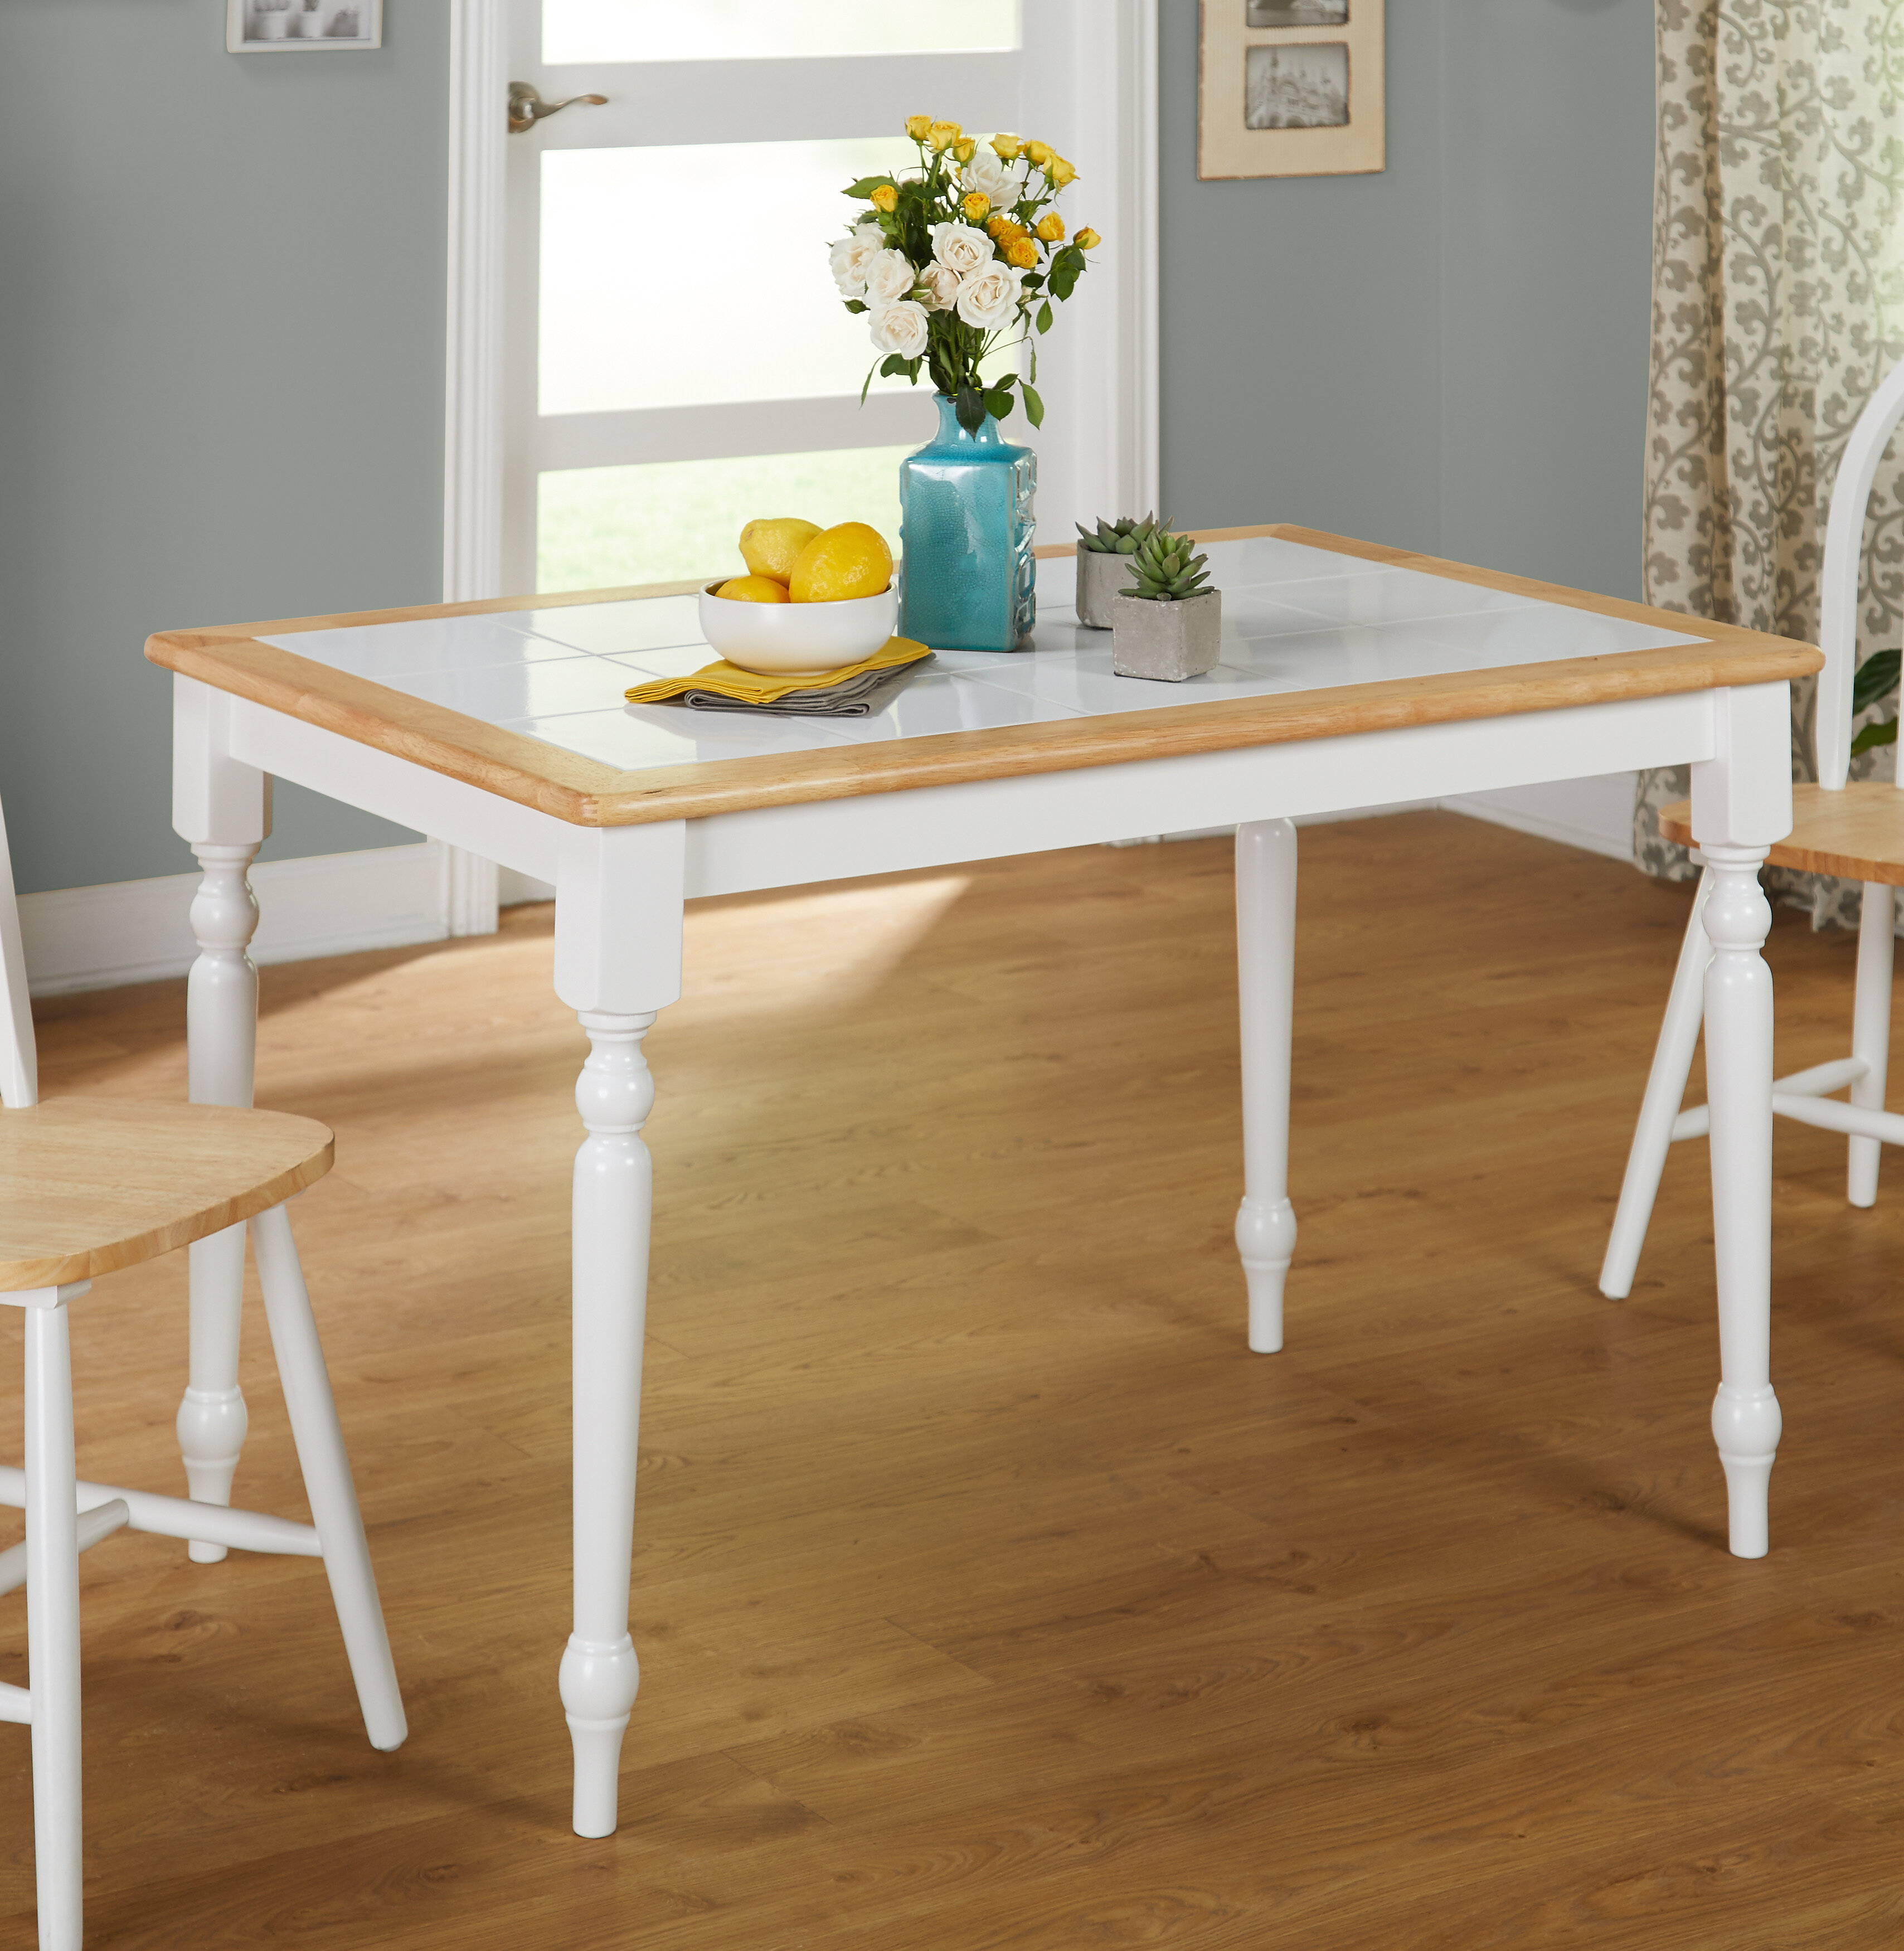 August Grove Trinidad Top Dining Table Reviews Wayfair